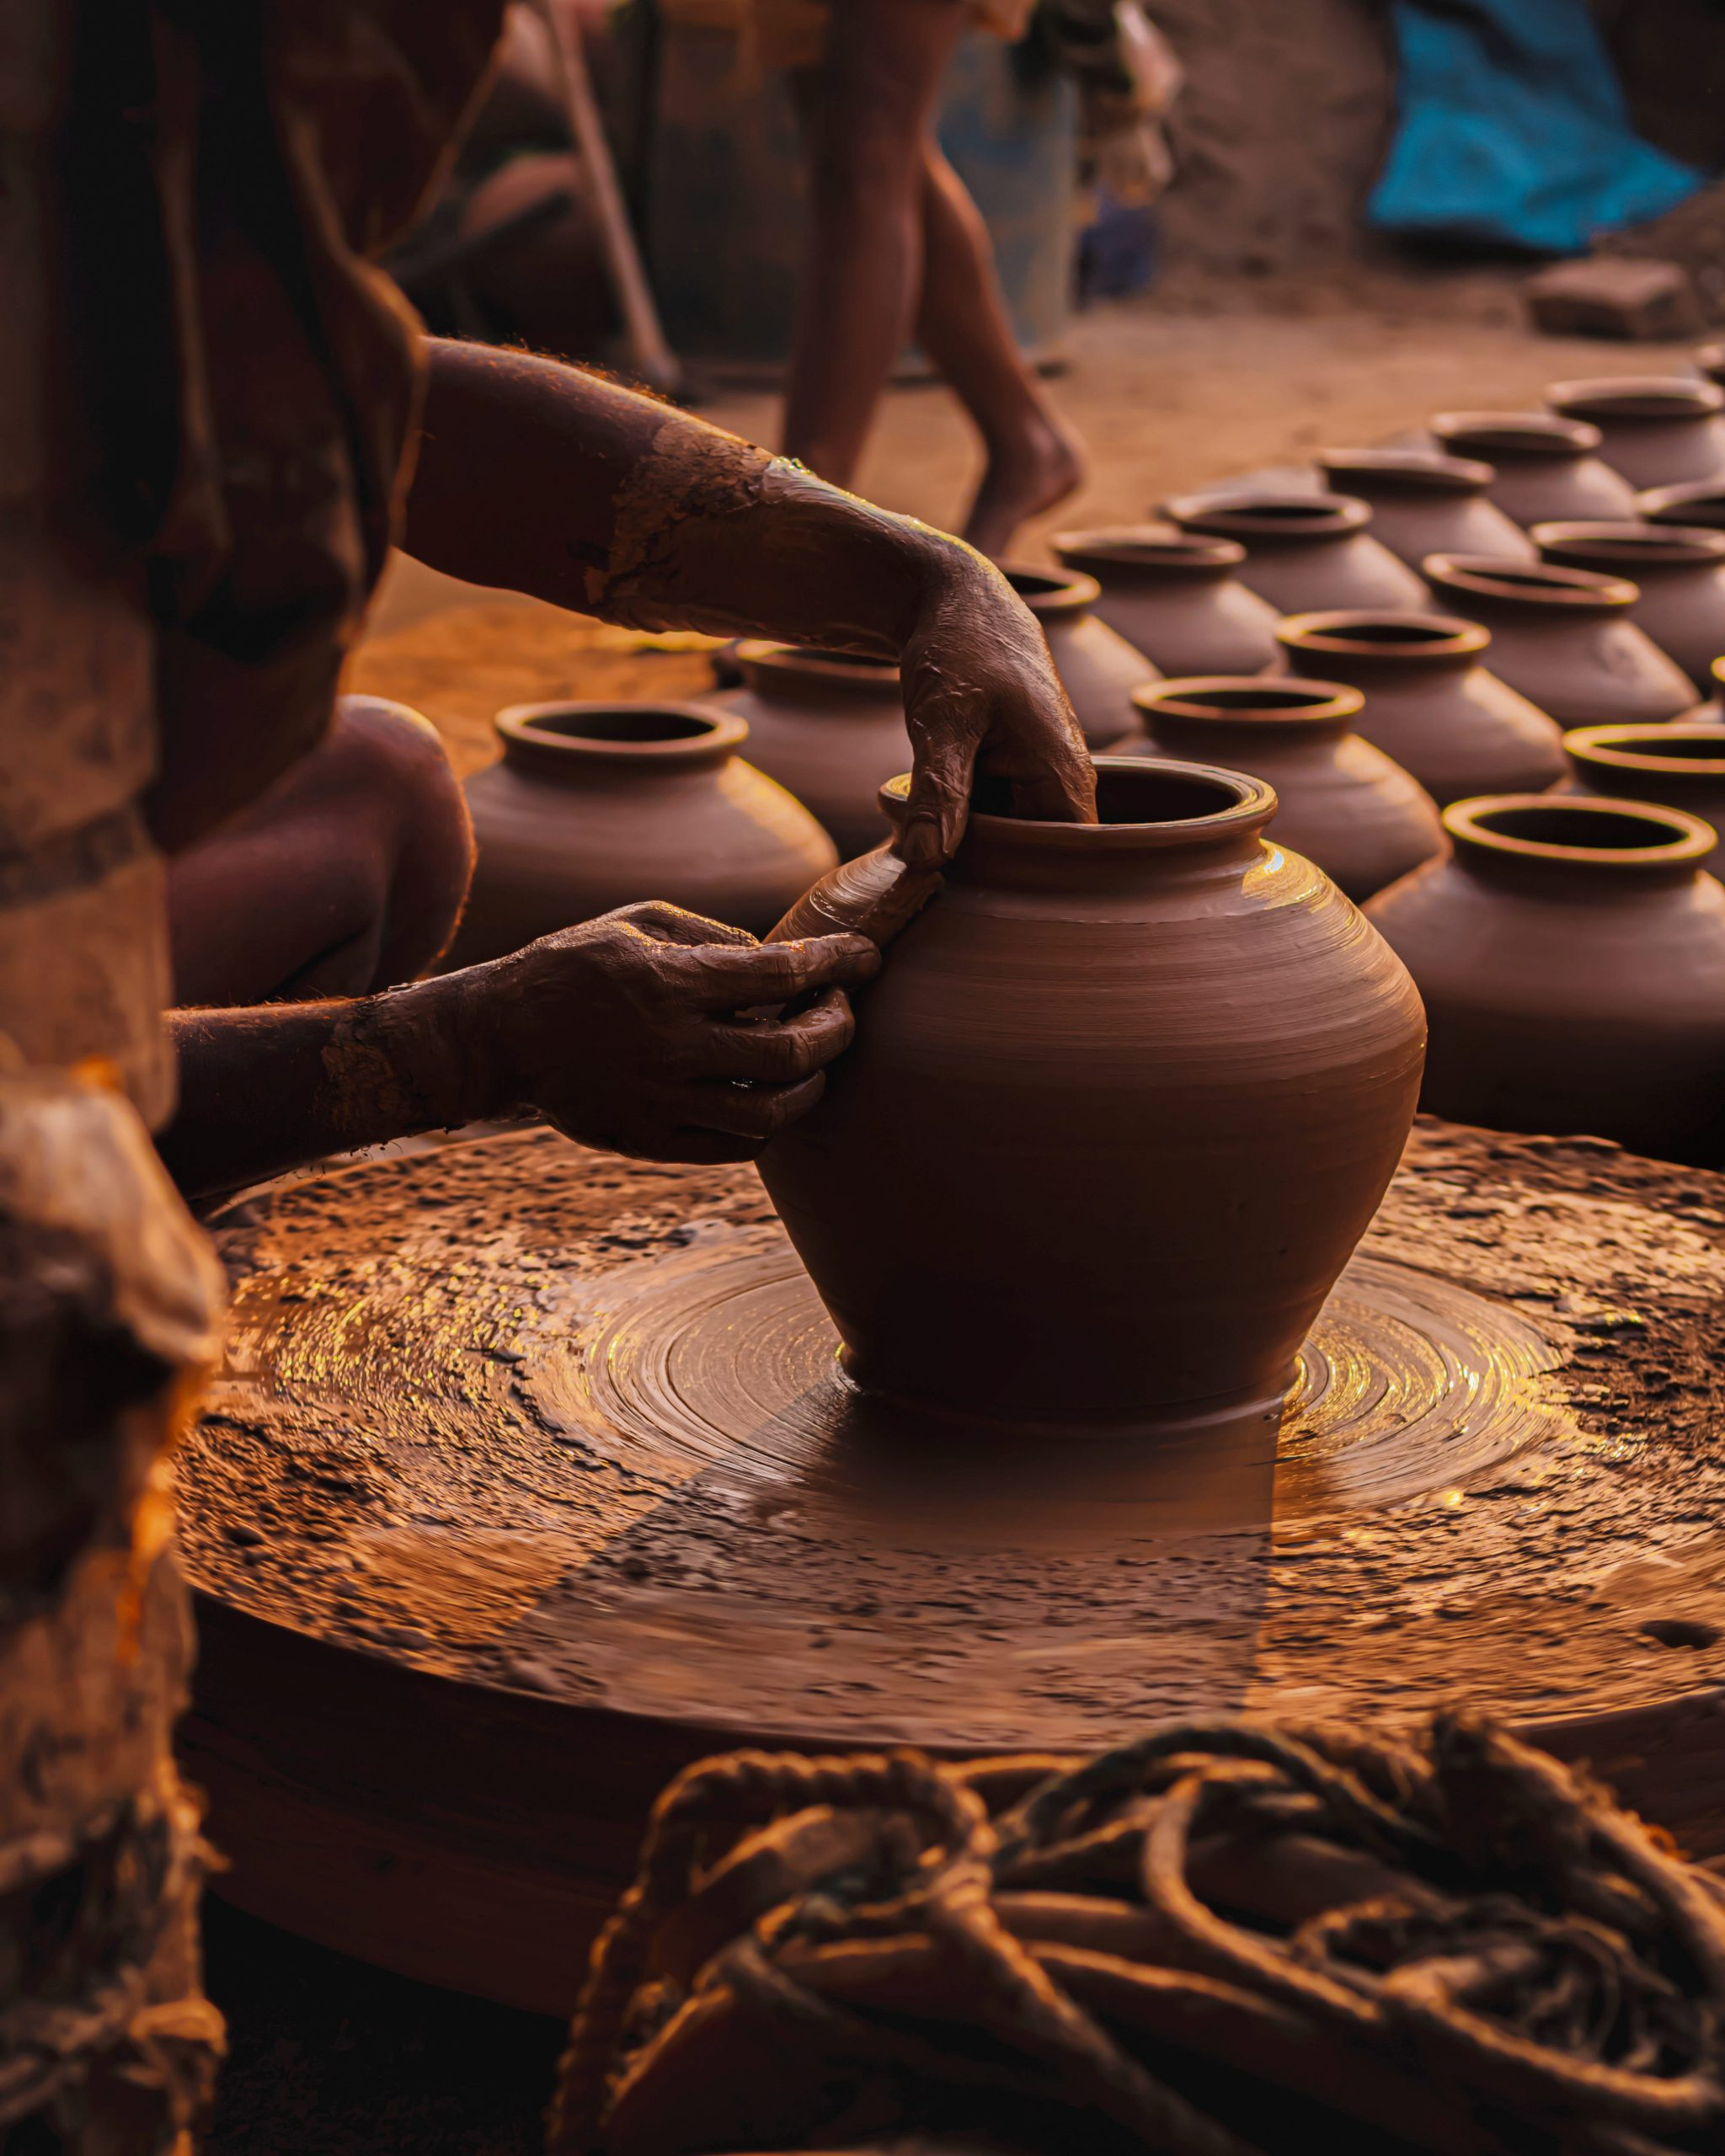 Potter making clay pot